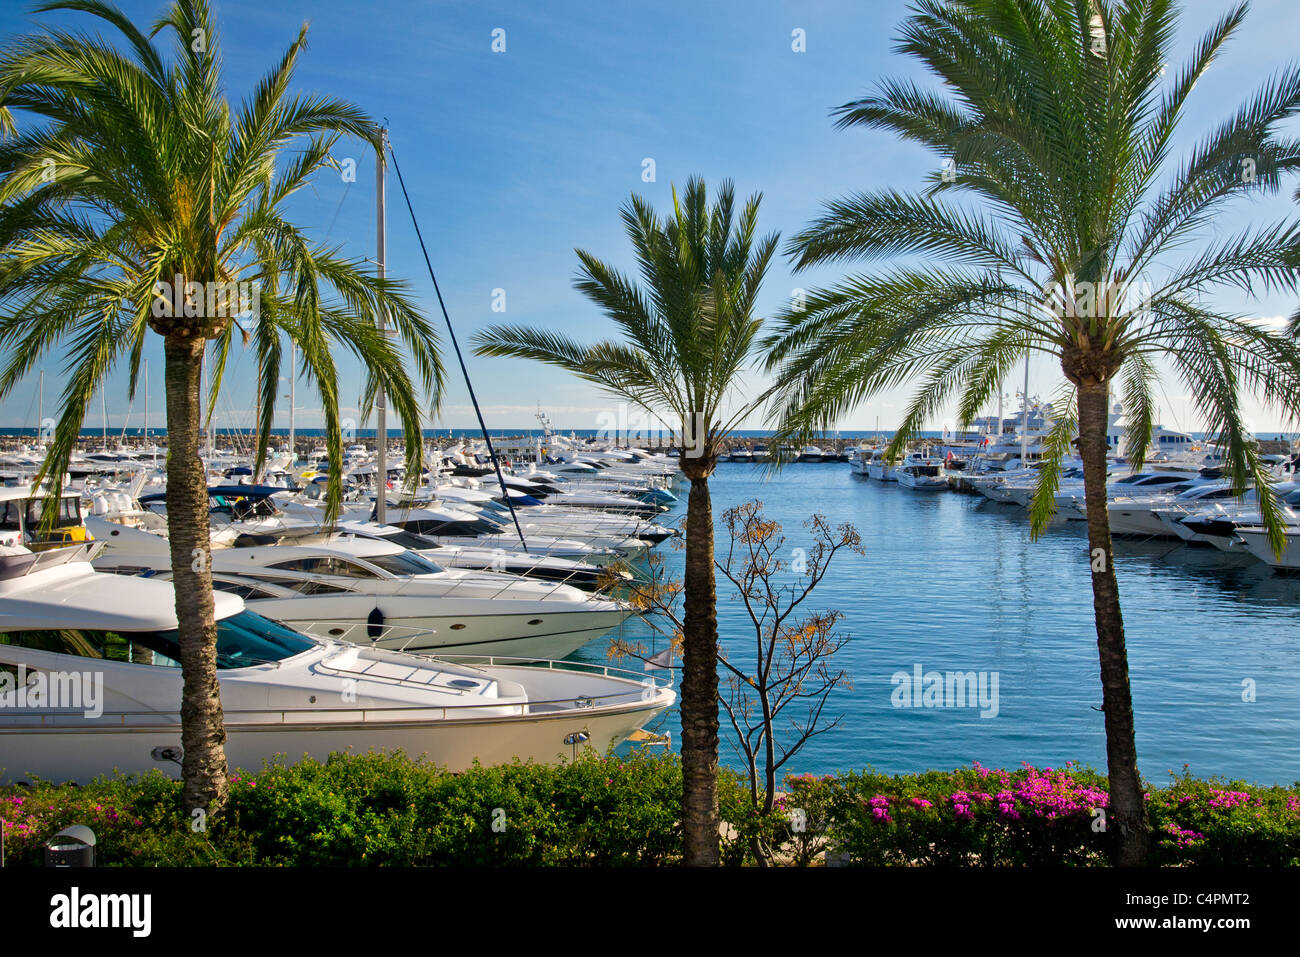 PUERTO PORTALS YACHTS PALM TREES MALLORCA Luxury motor yachts moored at Puerto Portals marina Portals Nous Palma - Stock Image